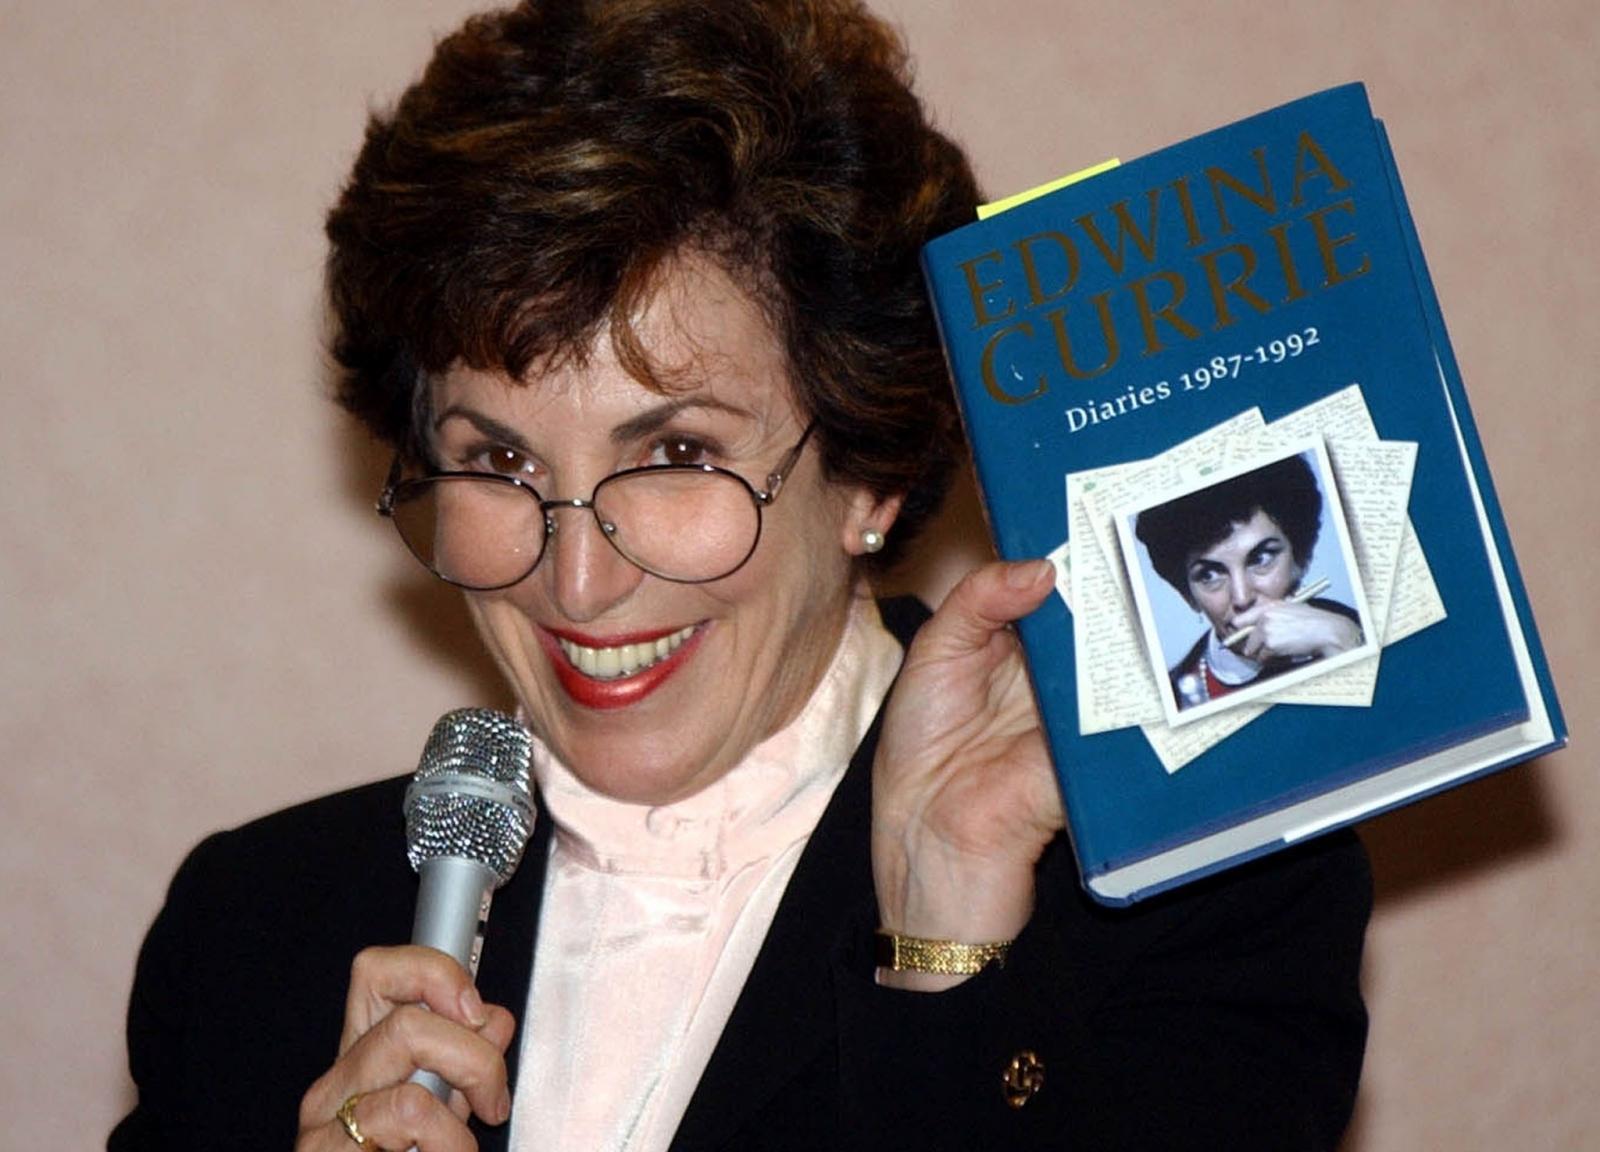 Edwina Currie reveals affair in her book in 2002